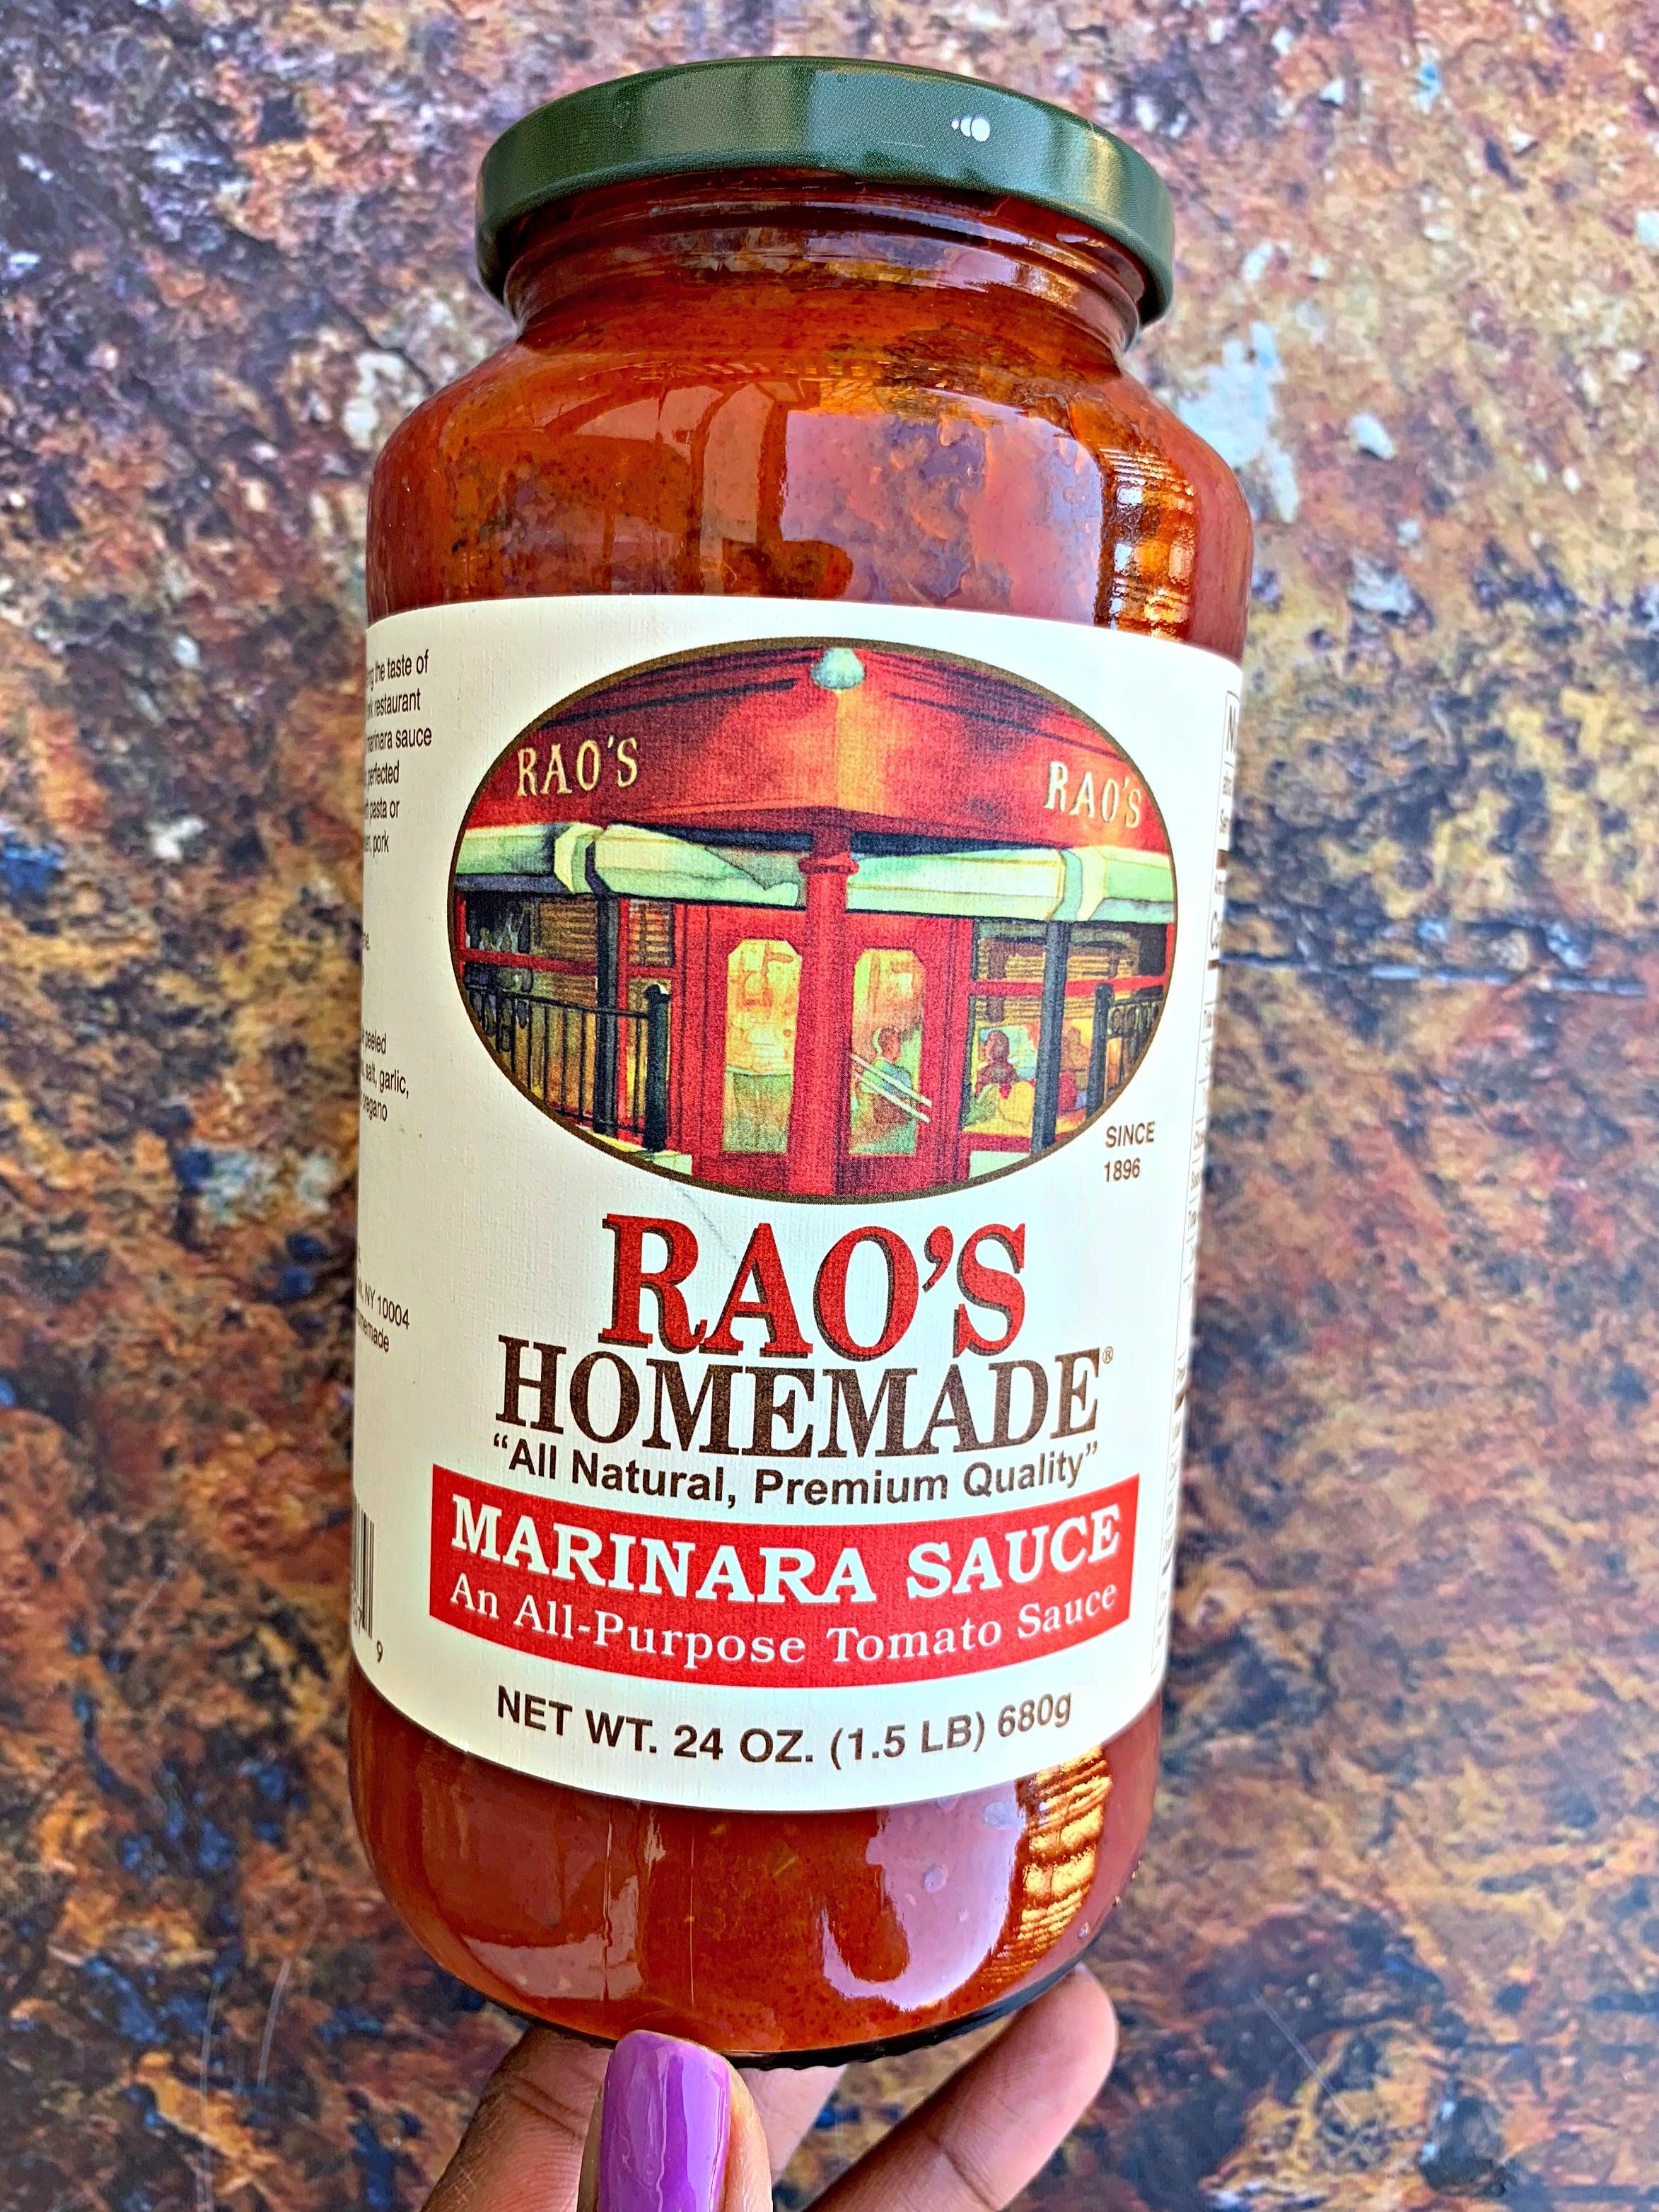 Raos marinara sauce in a jar